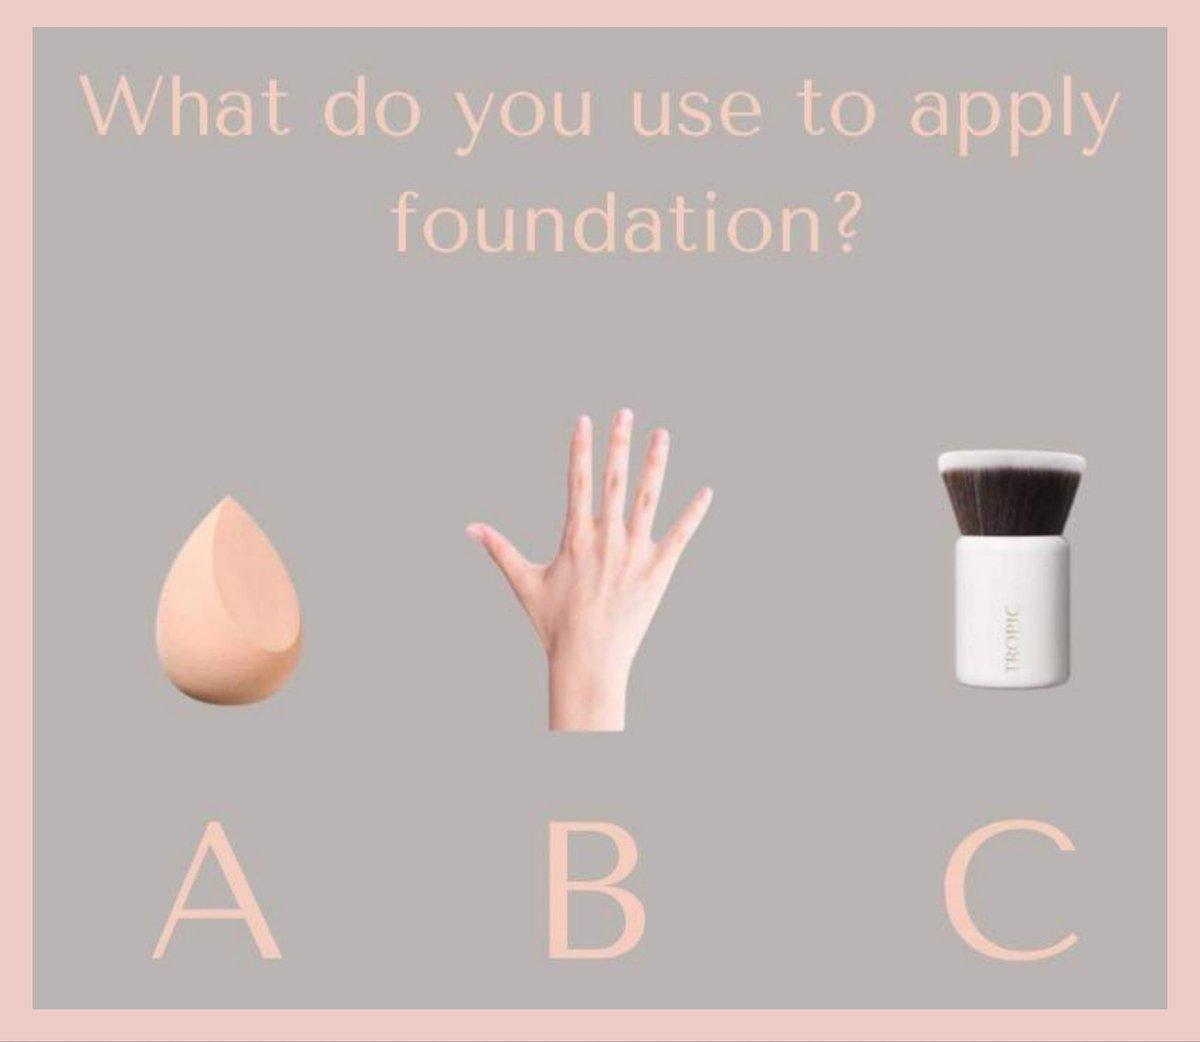 How do you apply your Foundation?